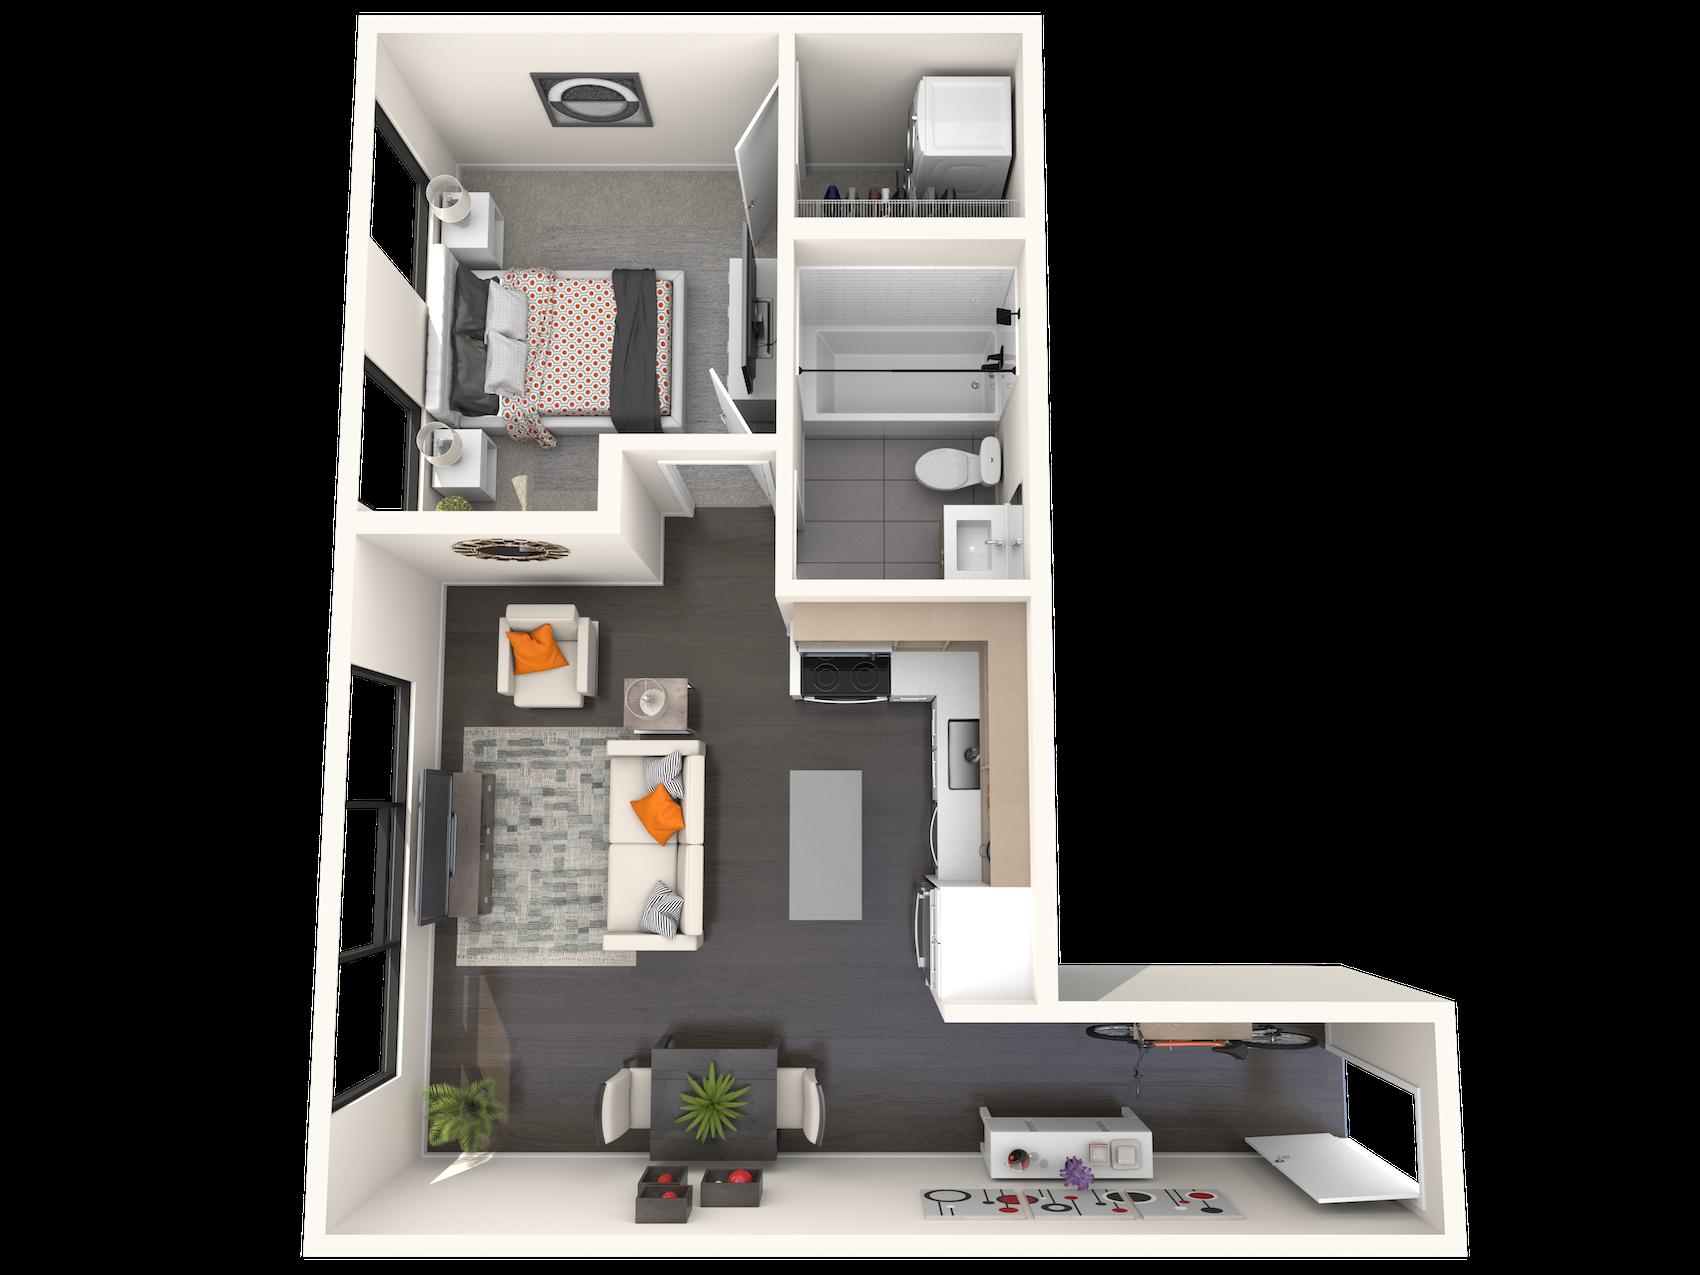 B1.7 Floor Plan